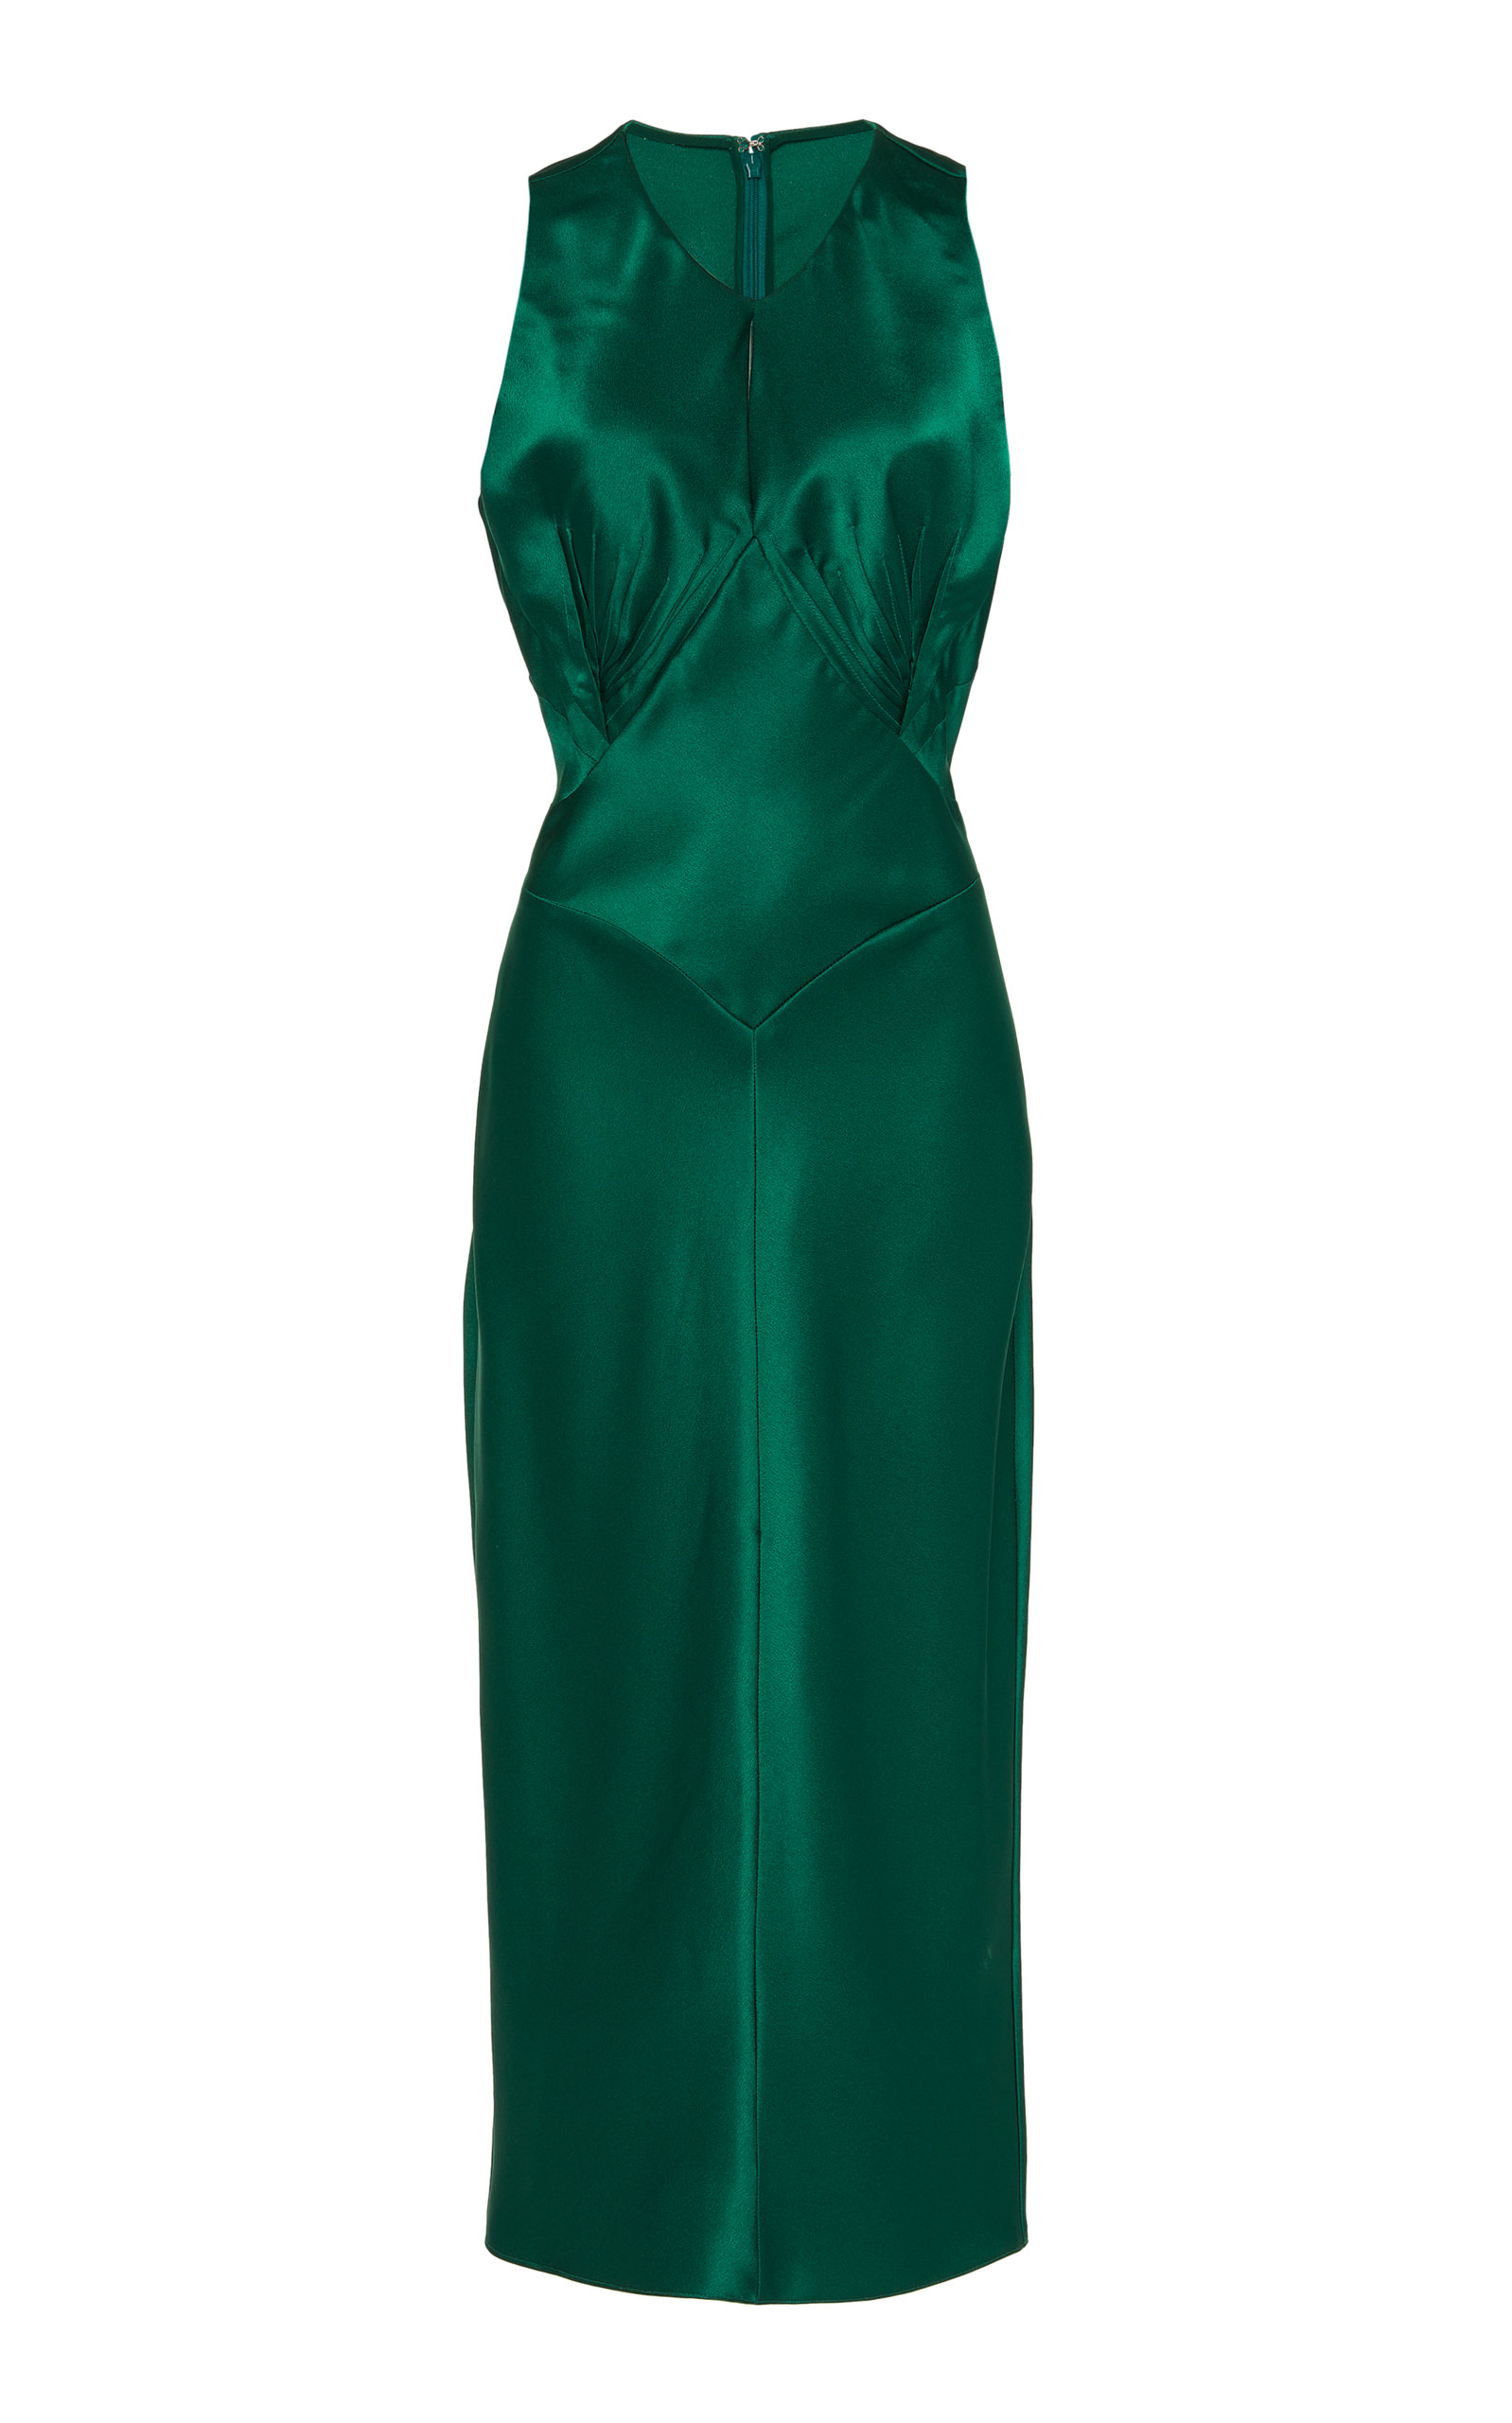 Buy Zac Posen Satin Sleeveless Midi Dress online, shop Zac Posen at the best price